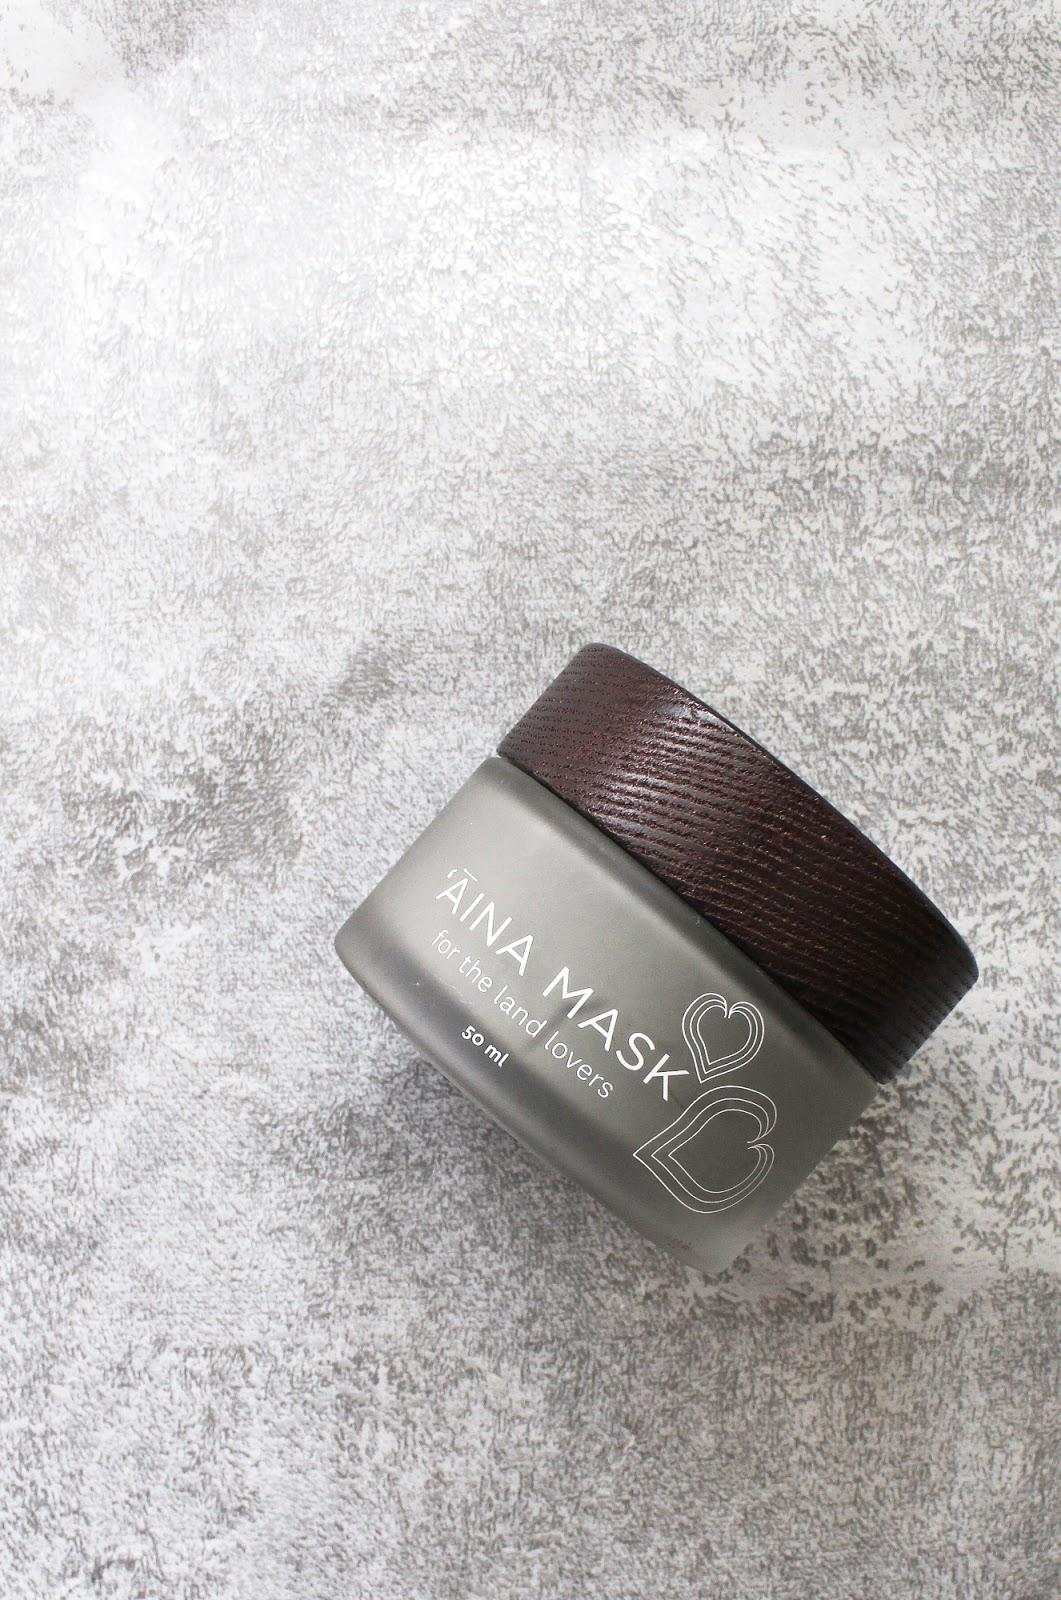 Honua Aina Mask for the land lovers. Clean Beauty Box